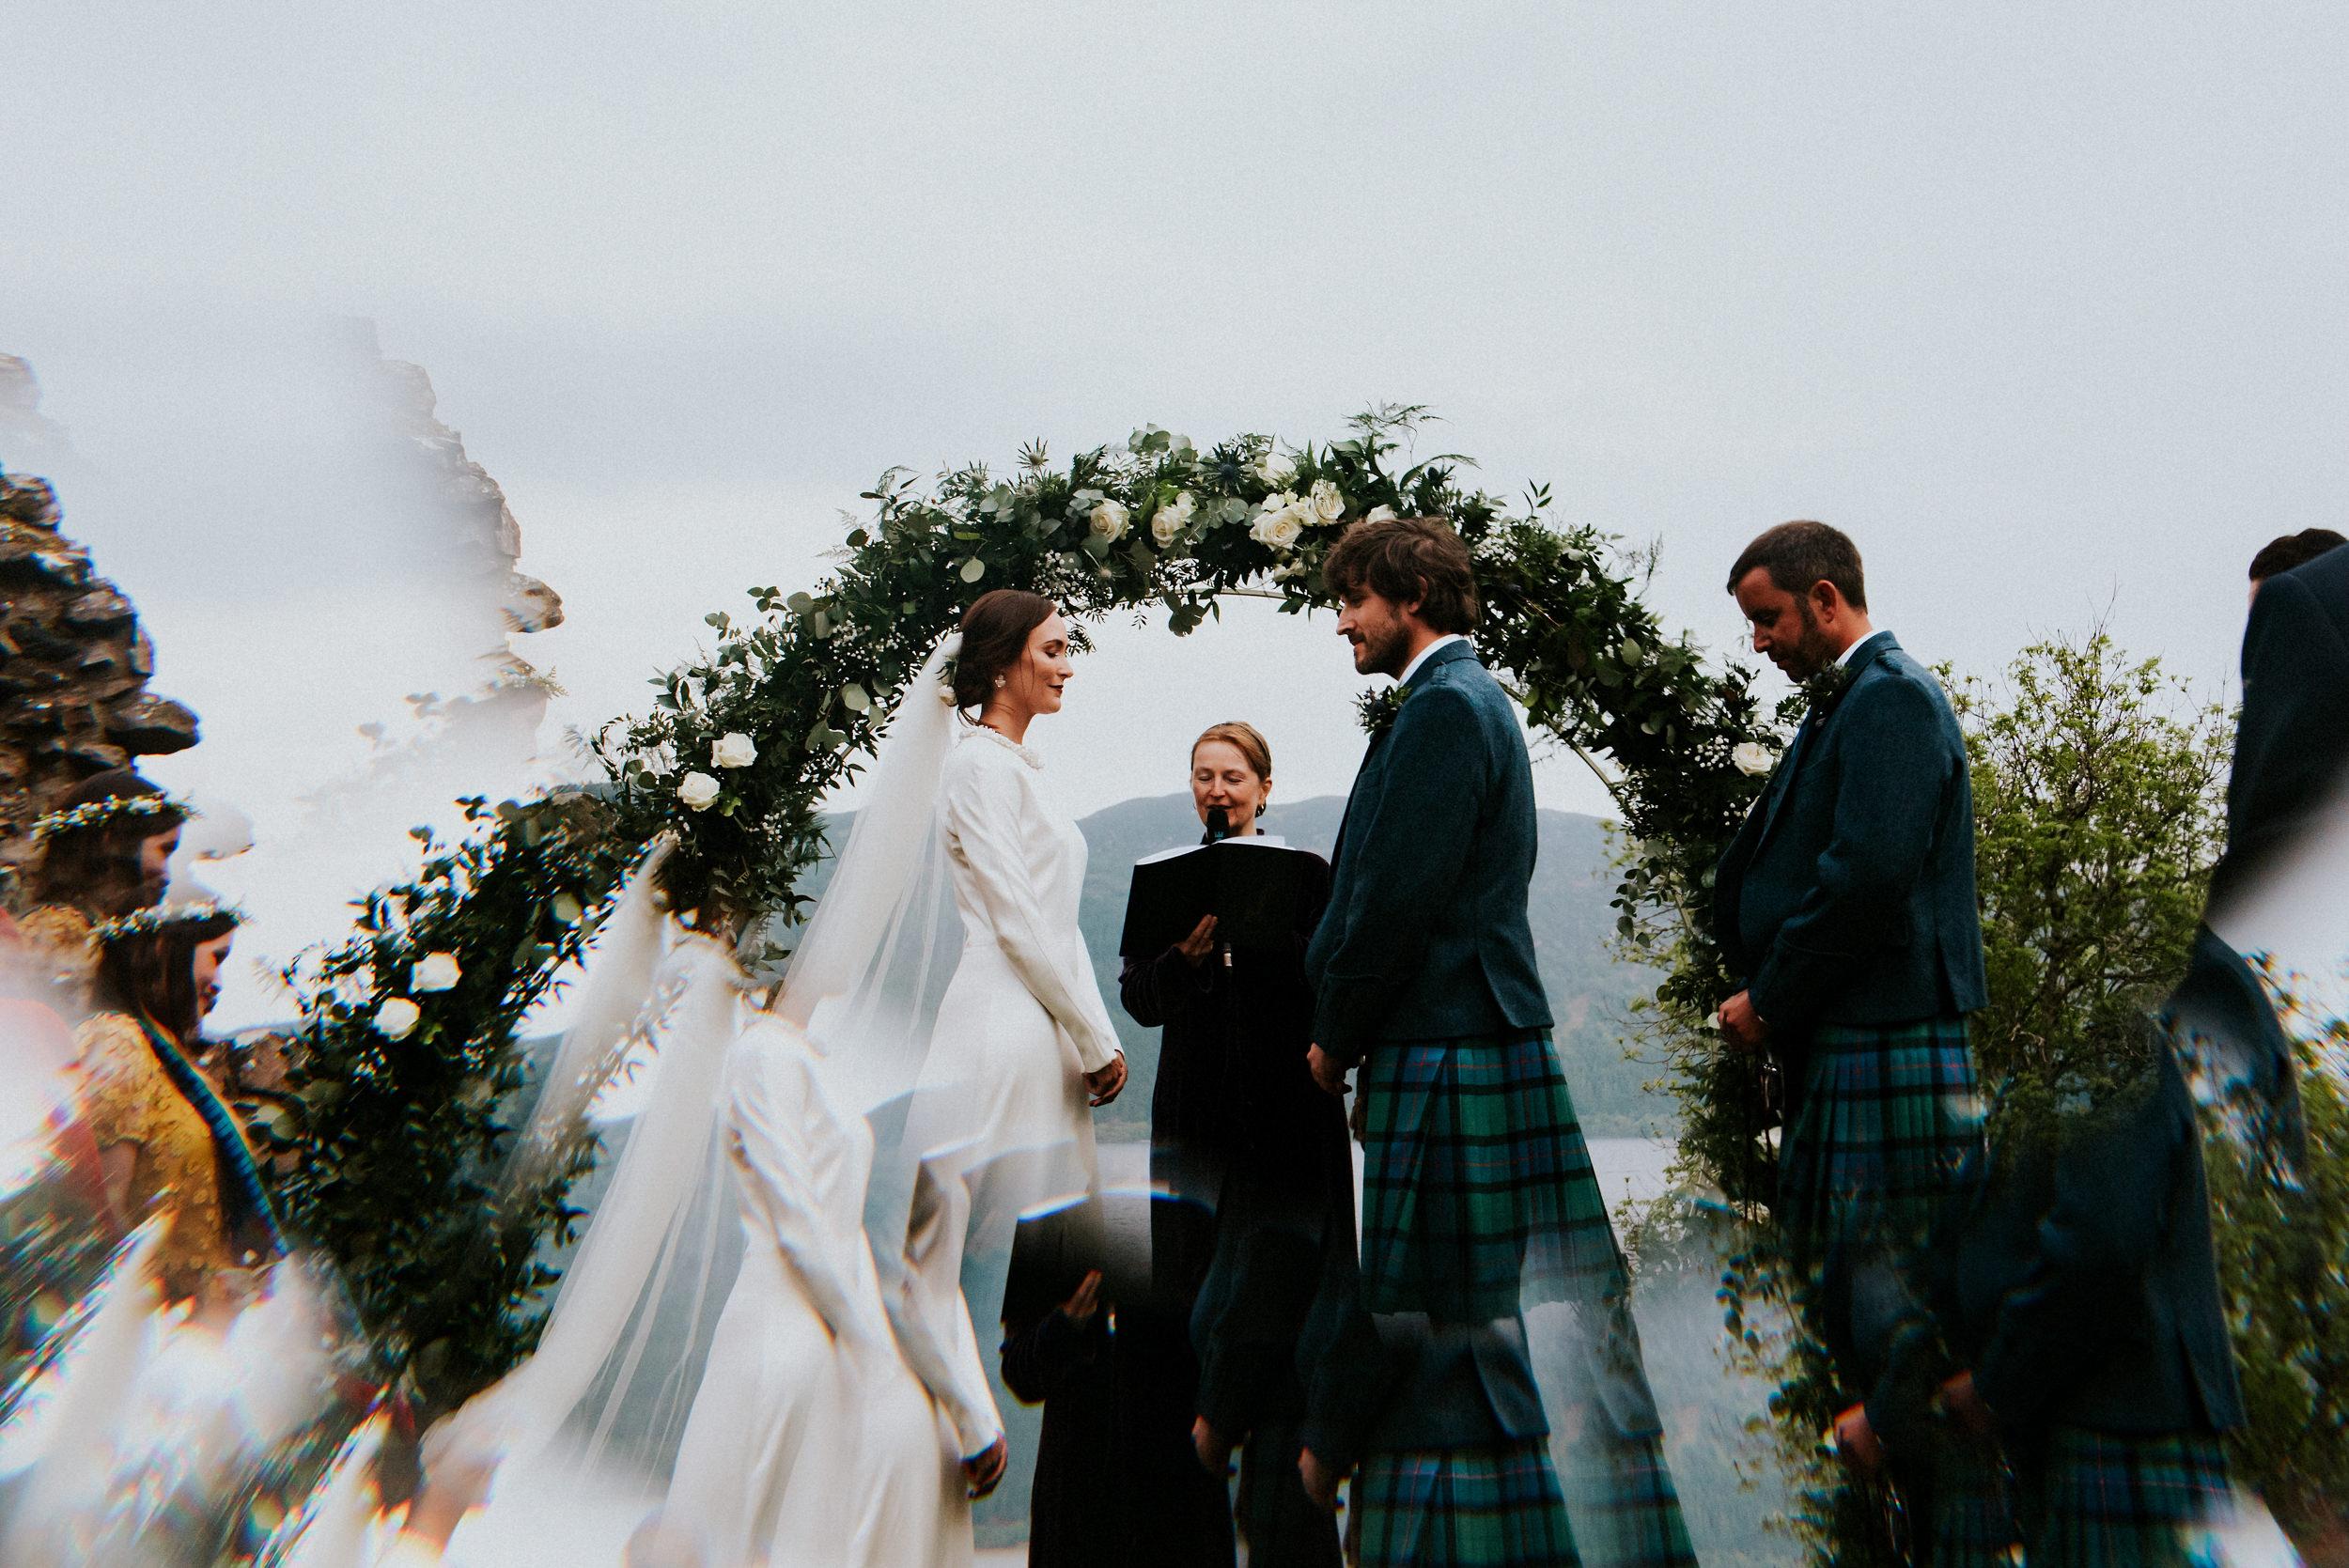 Loch Ness Alternative Wedding Photographer Shutter Go Click Urquart Castle Ceremony-61.jpg